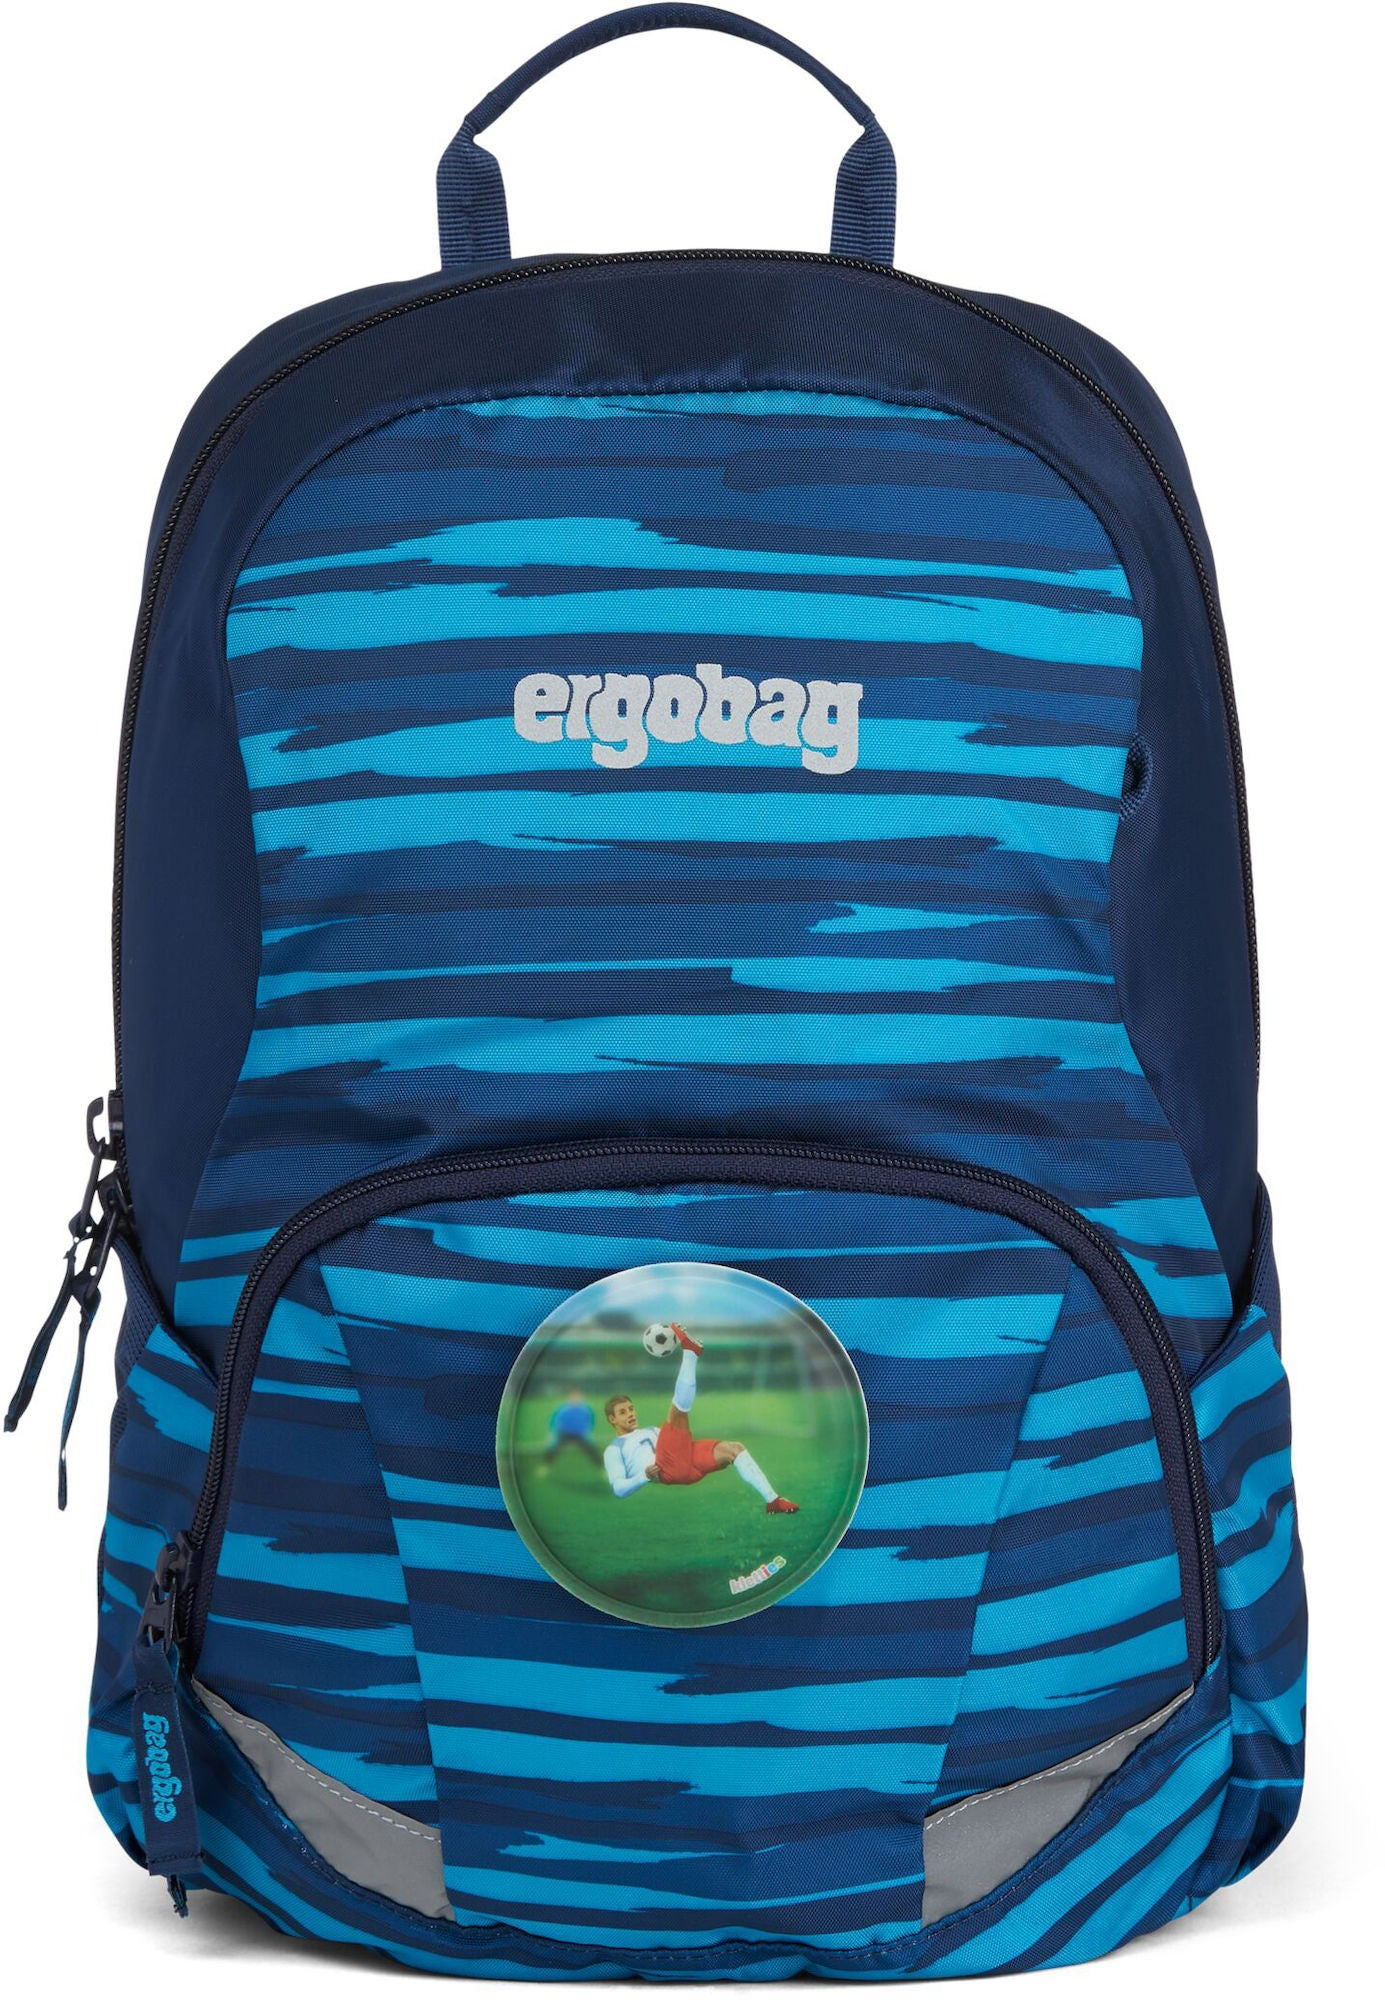 Ergobag Ease Striker Ryggsäck 10L, Blue Check